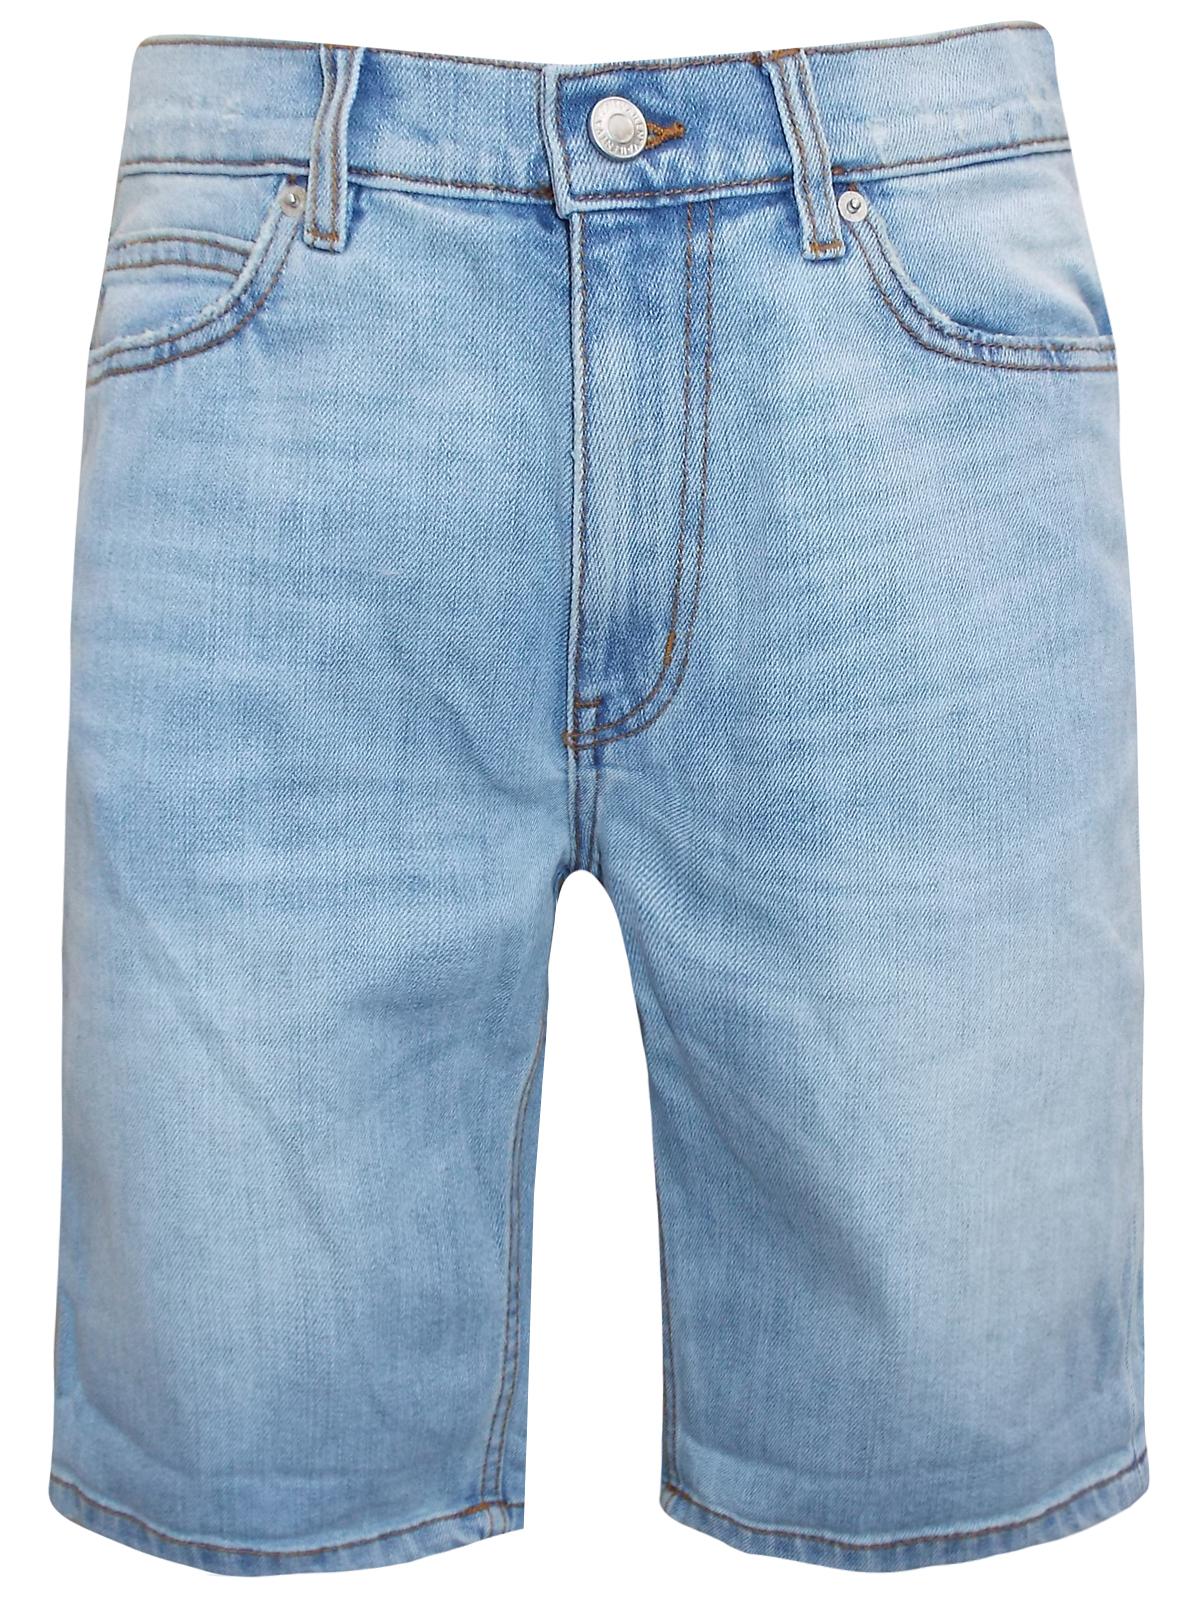 36c88c2e0d78 Vailent Pure STONE-WASH Cotton Rich 5-Pocket Distressed Denim Shorts -  Waist Size 28 to 36. SKU[36261]